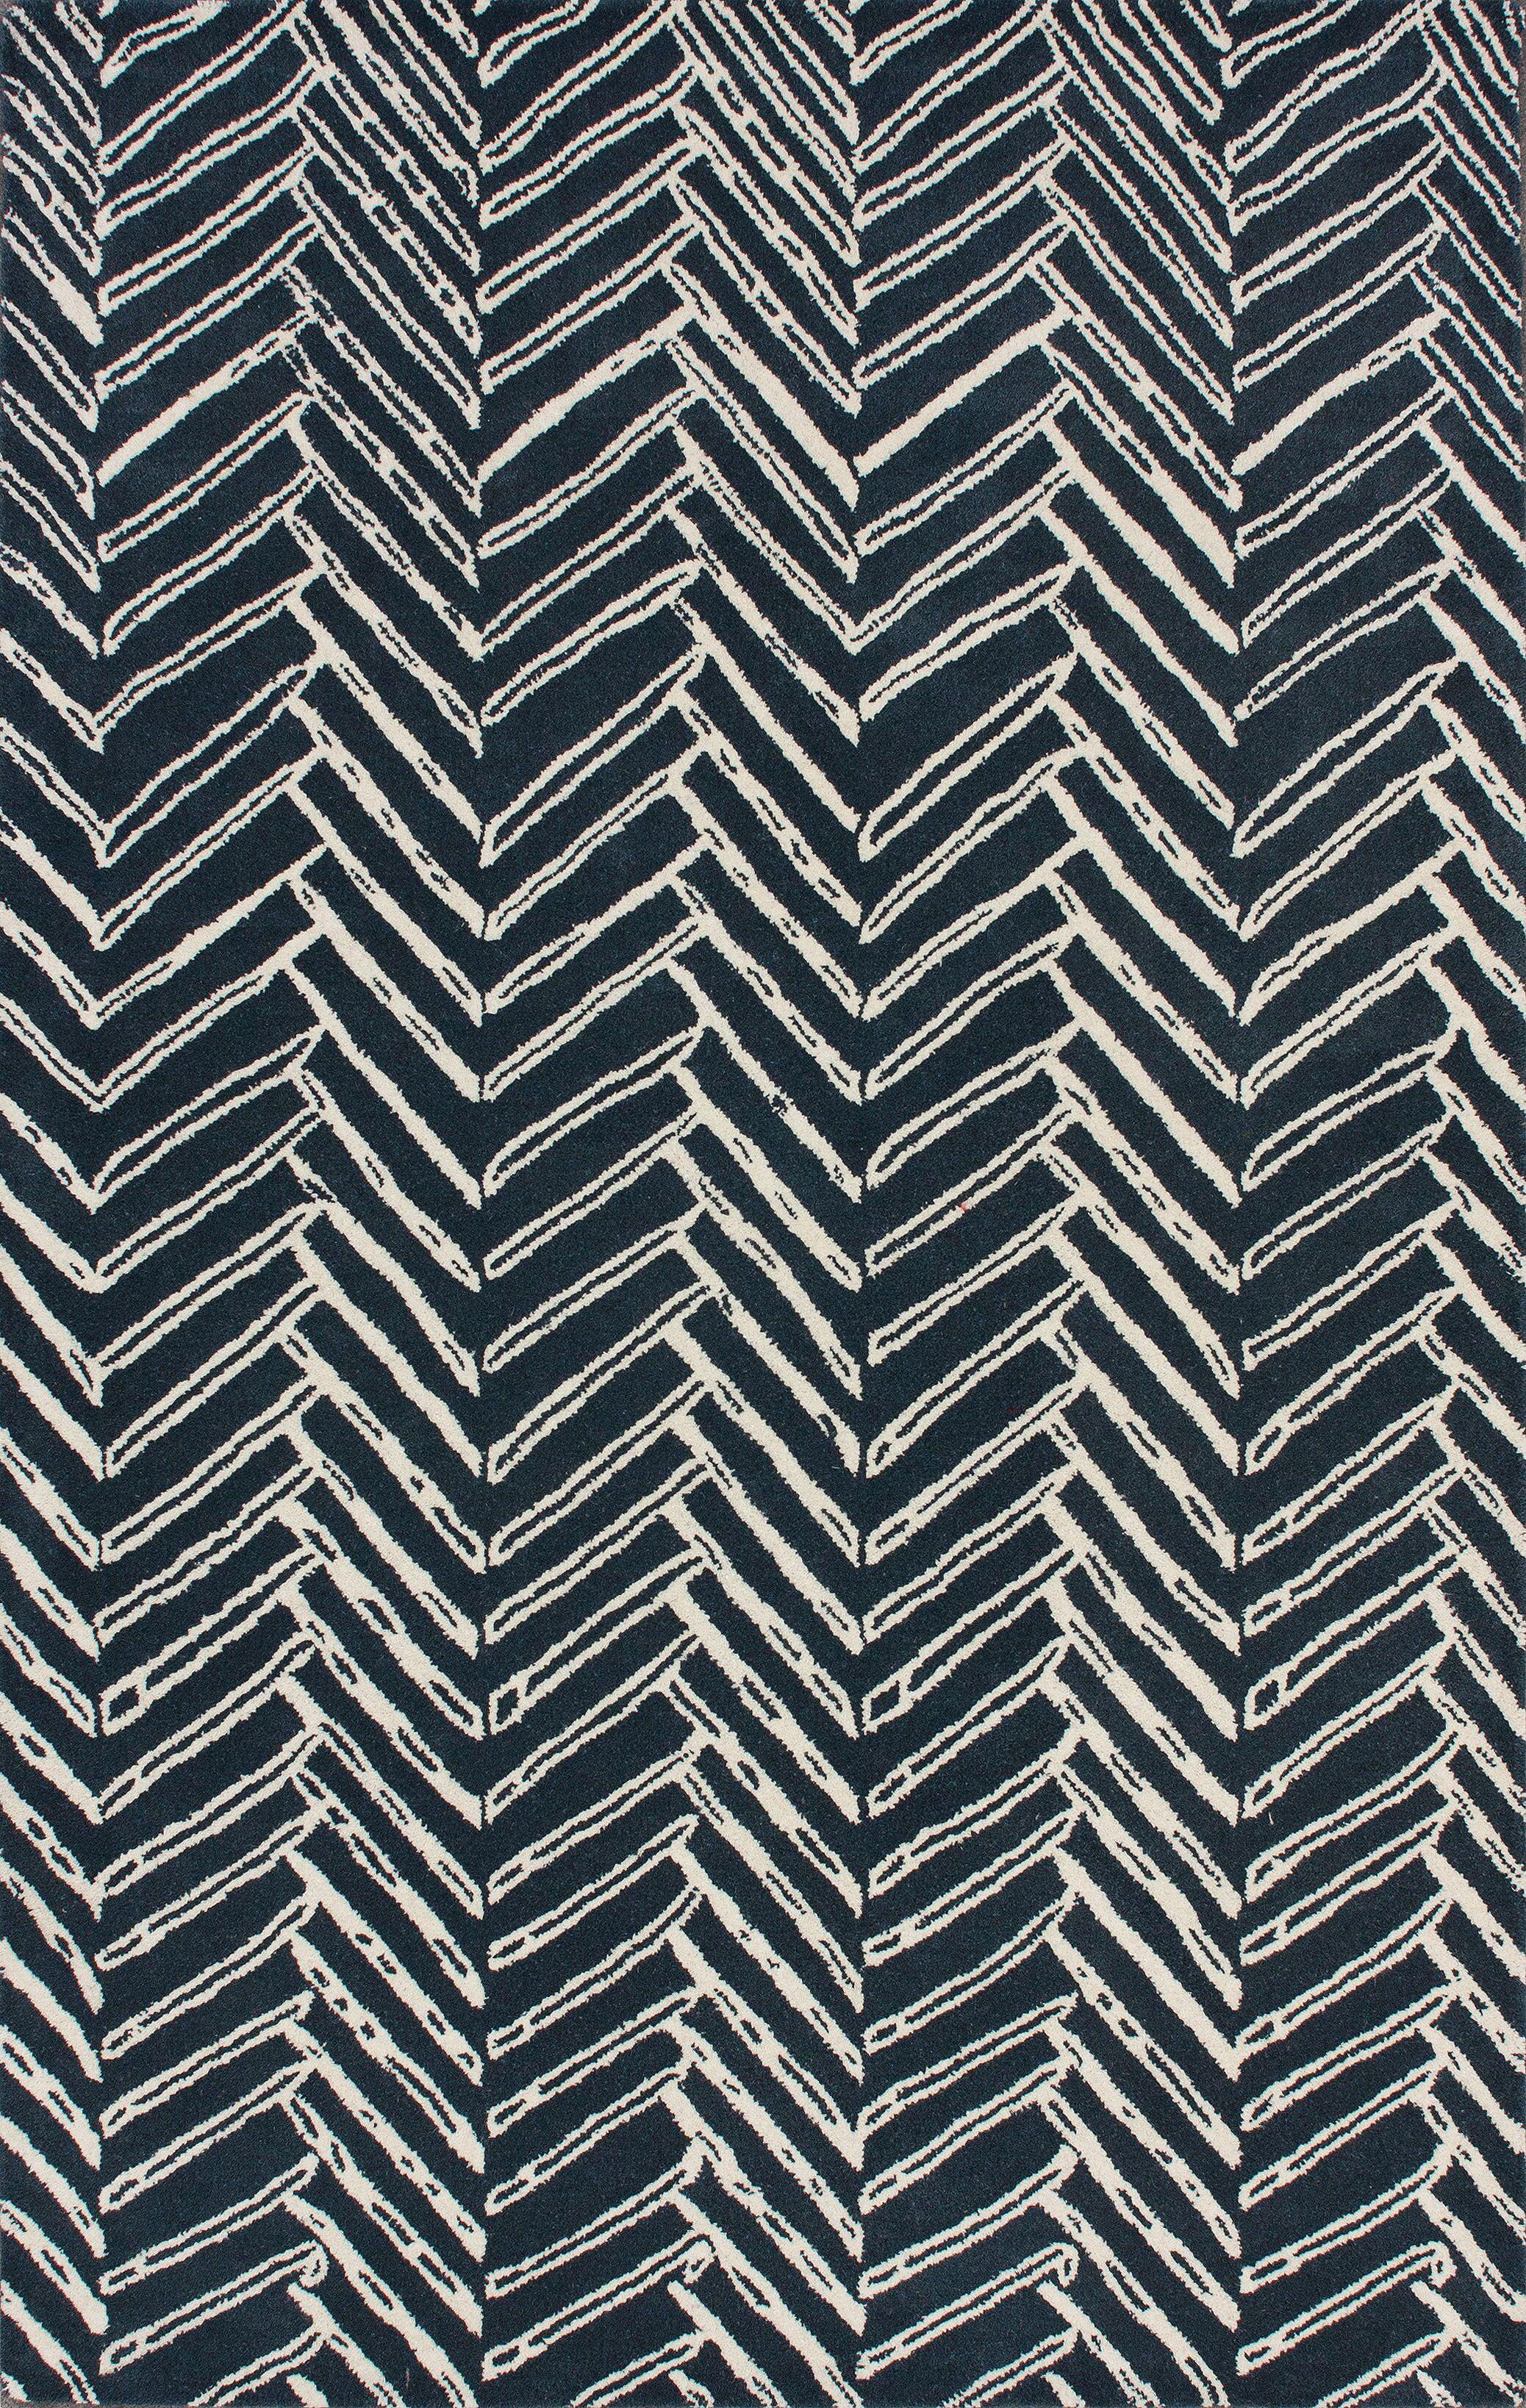 Olivo Denim Chevron Area Rug Rug Size: Rectangle 3' x 5'